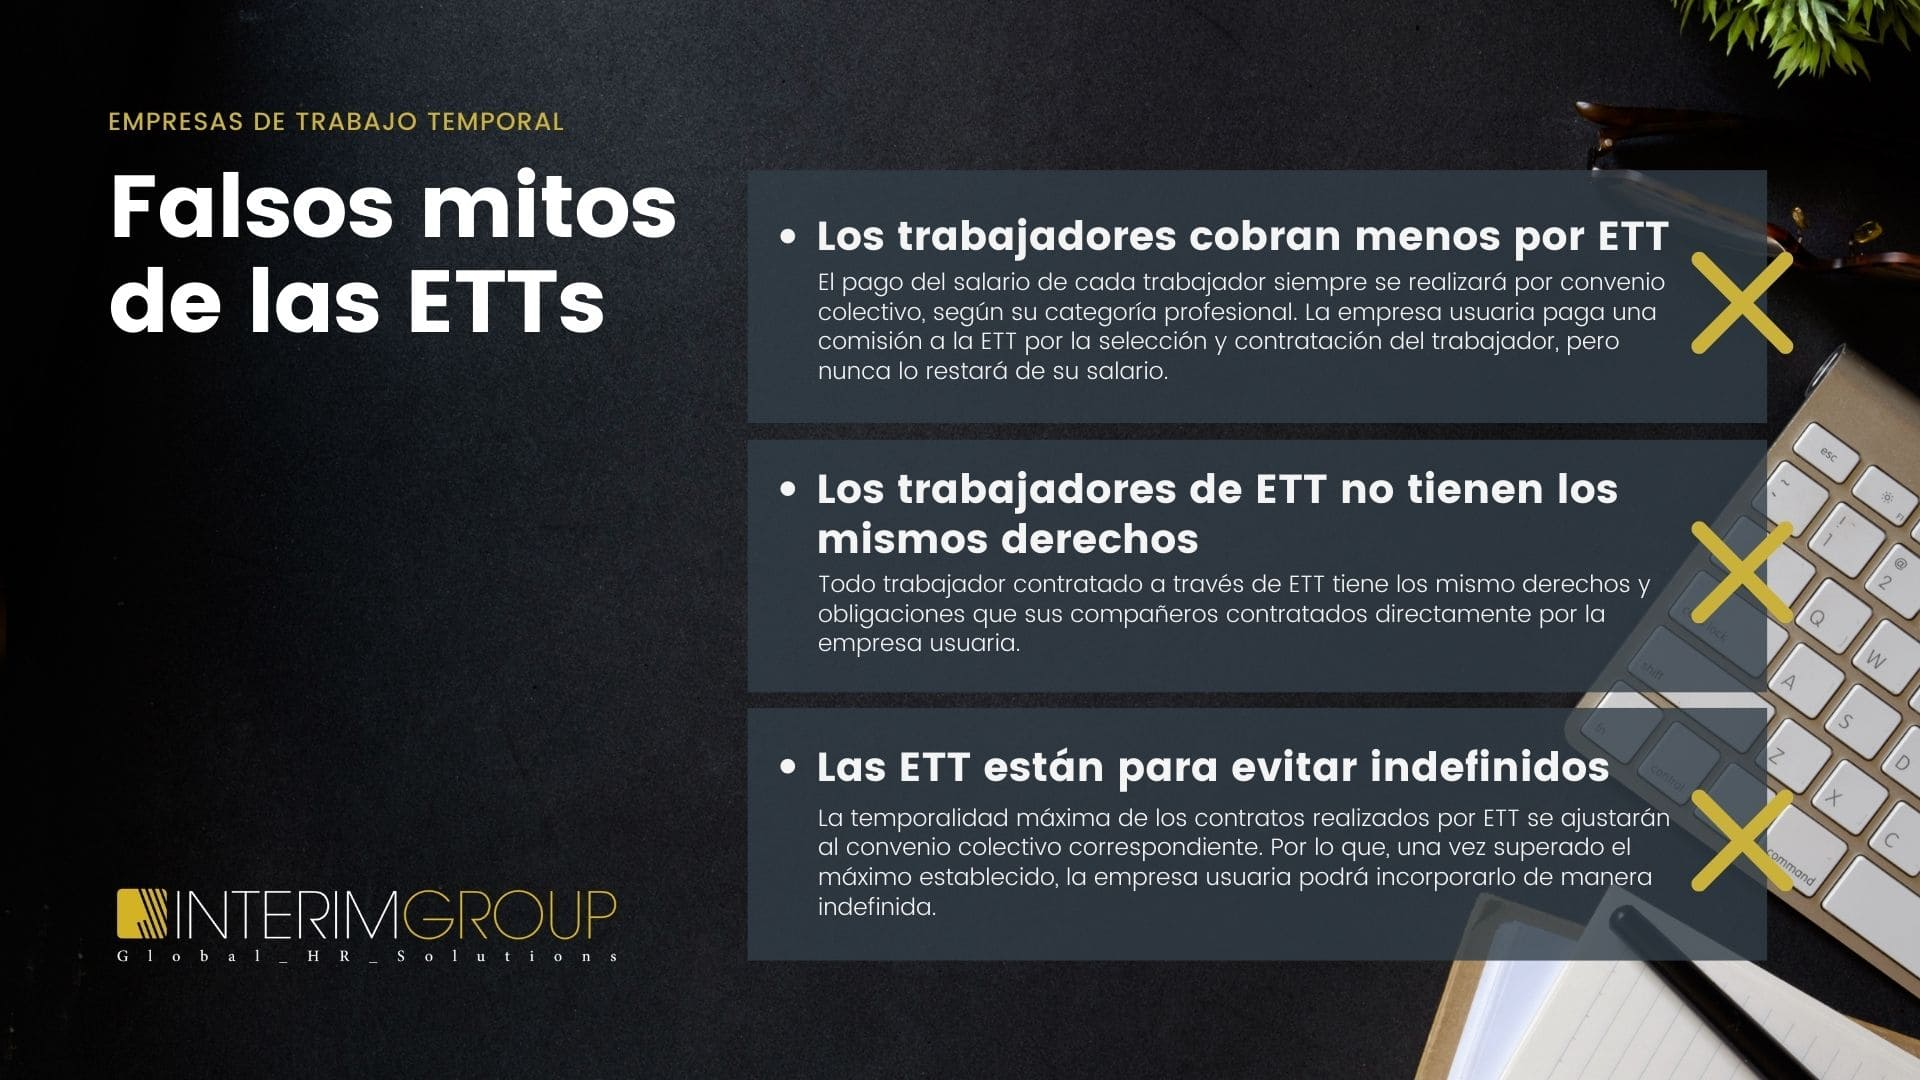 Falsos mitos de las ETT_INTERIM-GROUP